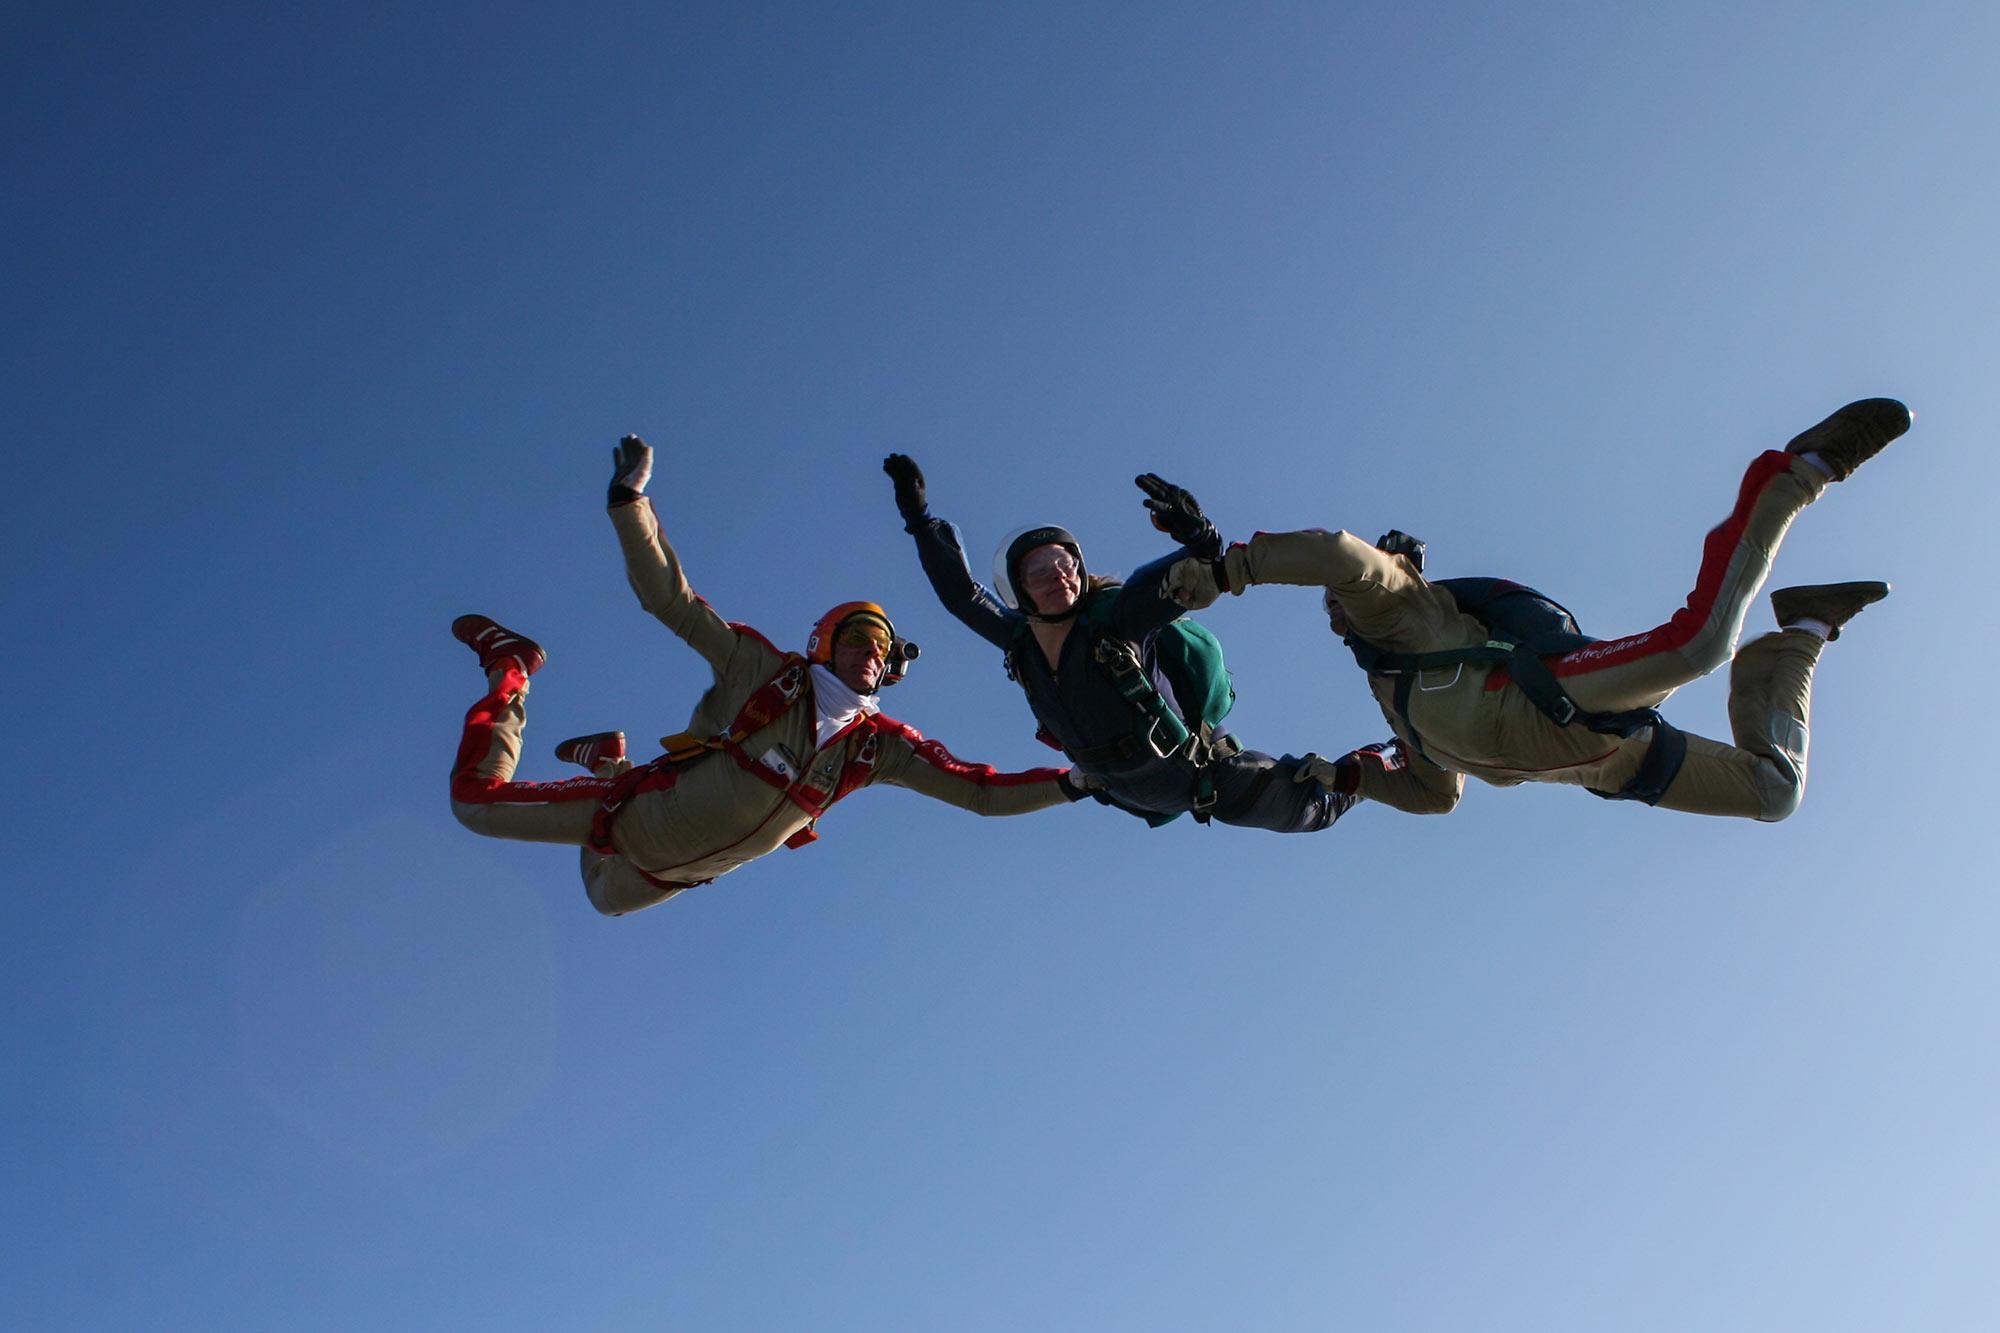 AFF Fallschirmausbildung -- Level 3 Sprung bei Skydive Colibri